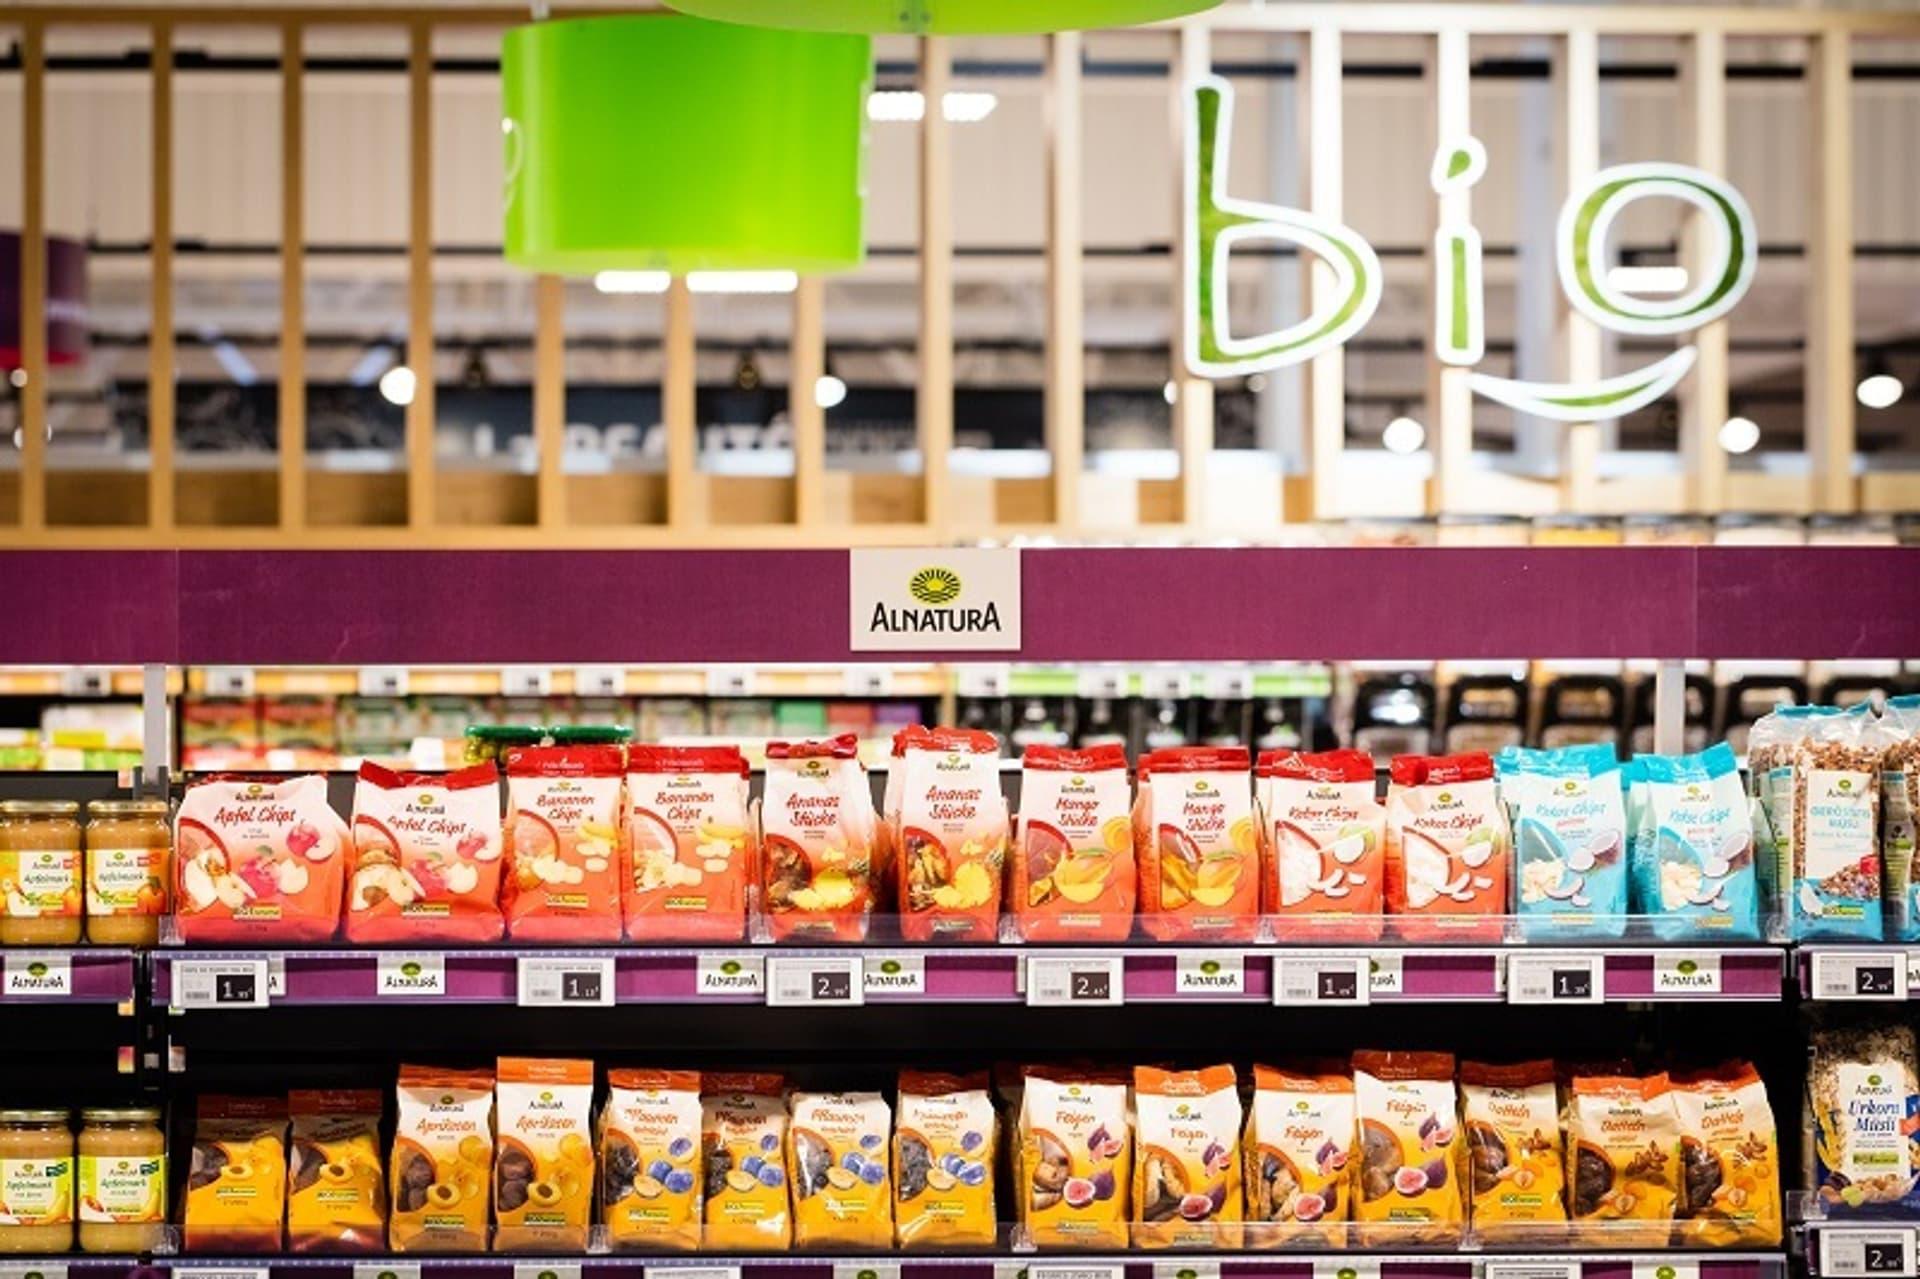 Alnatura Produkte bei Supermarches Match St Nicolas de Port Frankreich c PR Material Fotograf Ghesquiere